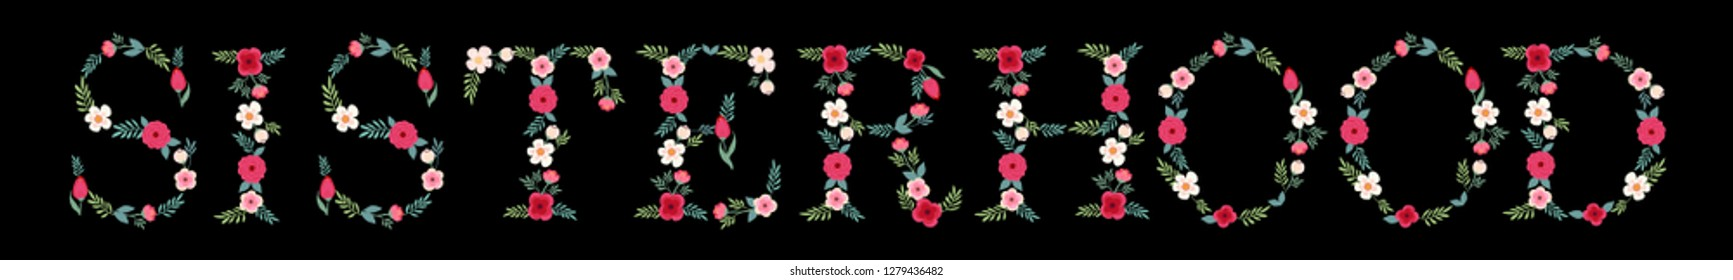 Beautiful Floral Lettering Inscription Sisterhood for your decoration